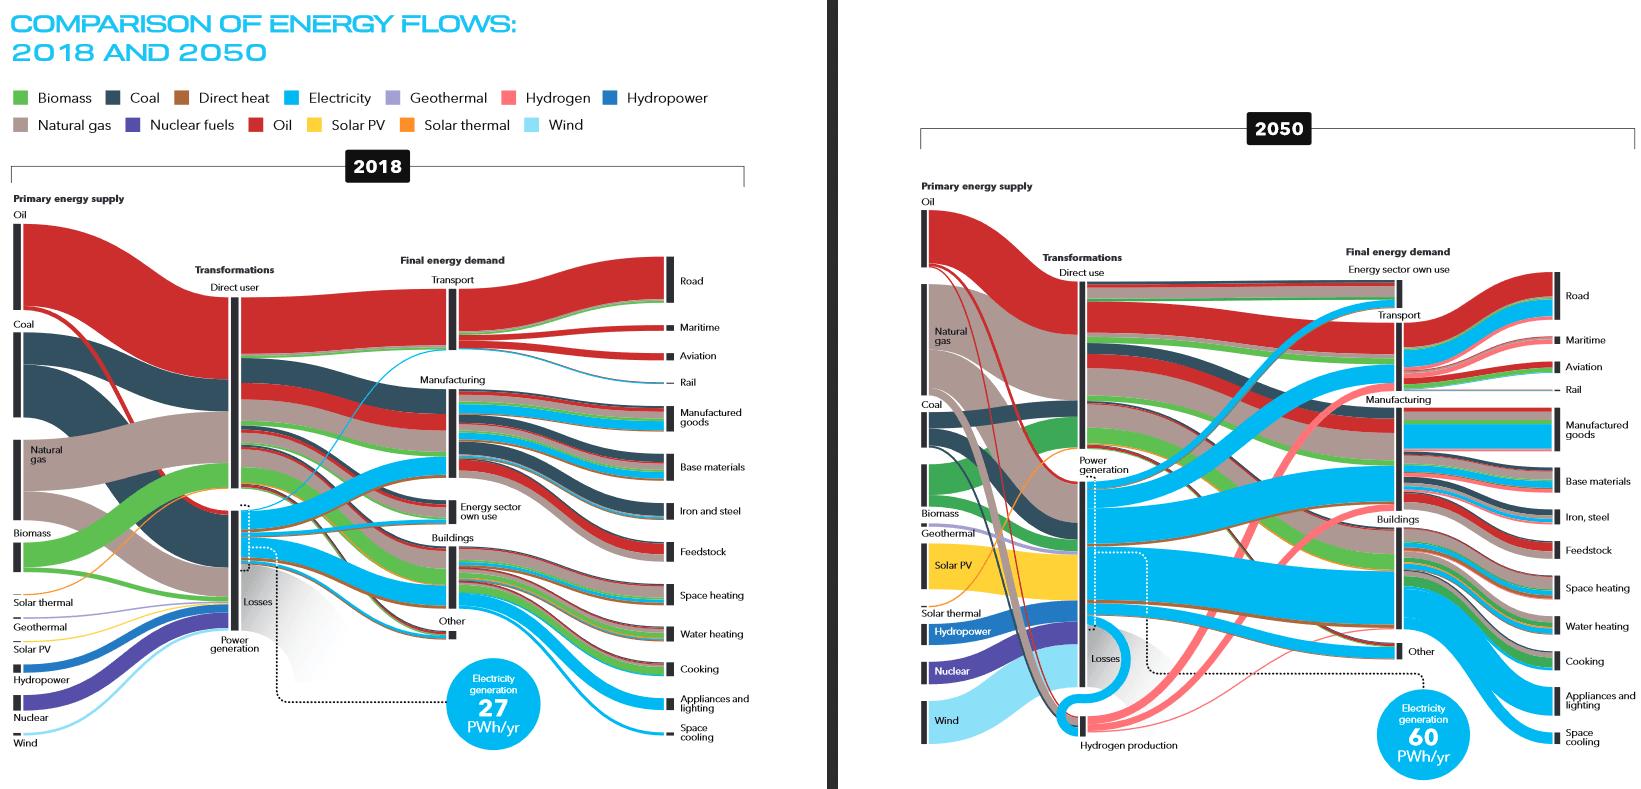 DNVGL-Energy-Outlook-Comparison-2018-2050